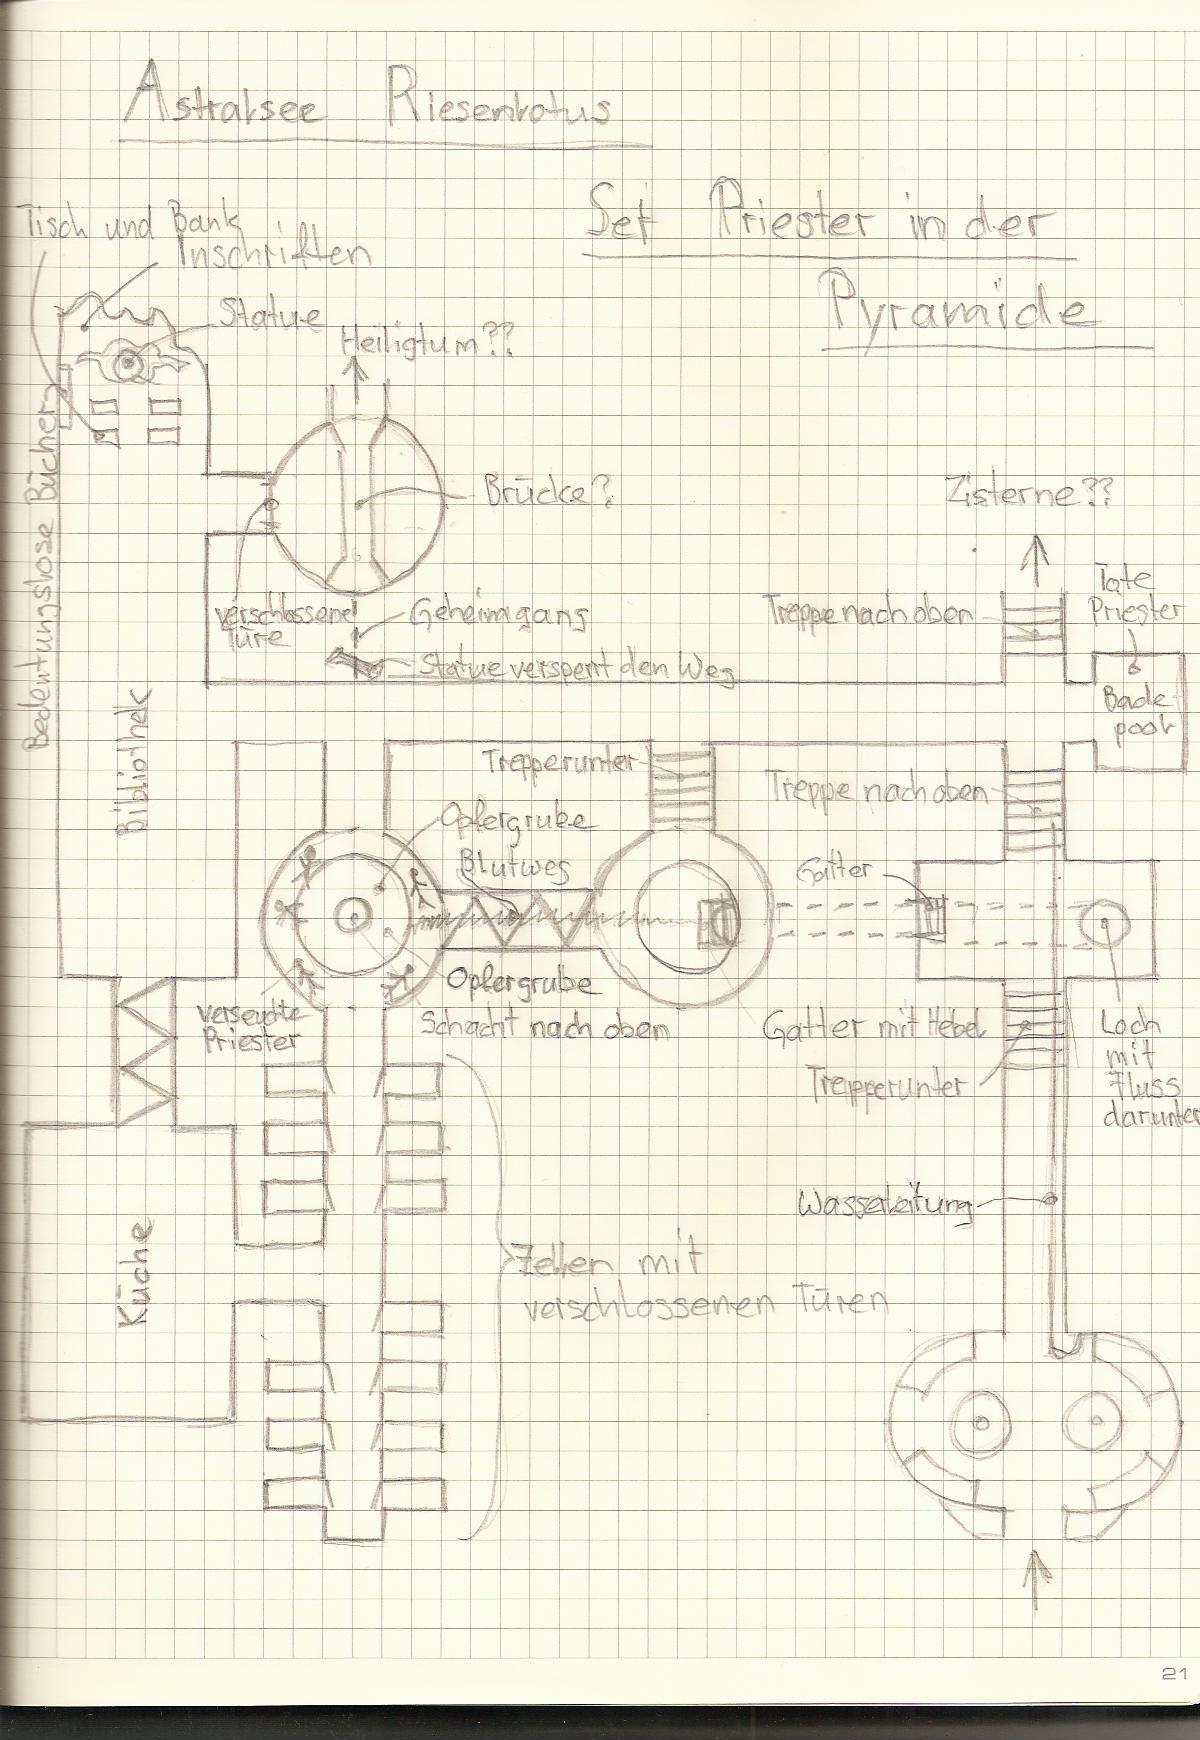 Astralsee-Riesenlotus_Set_Priester_in_der_Pyramide